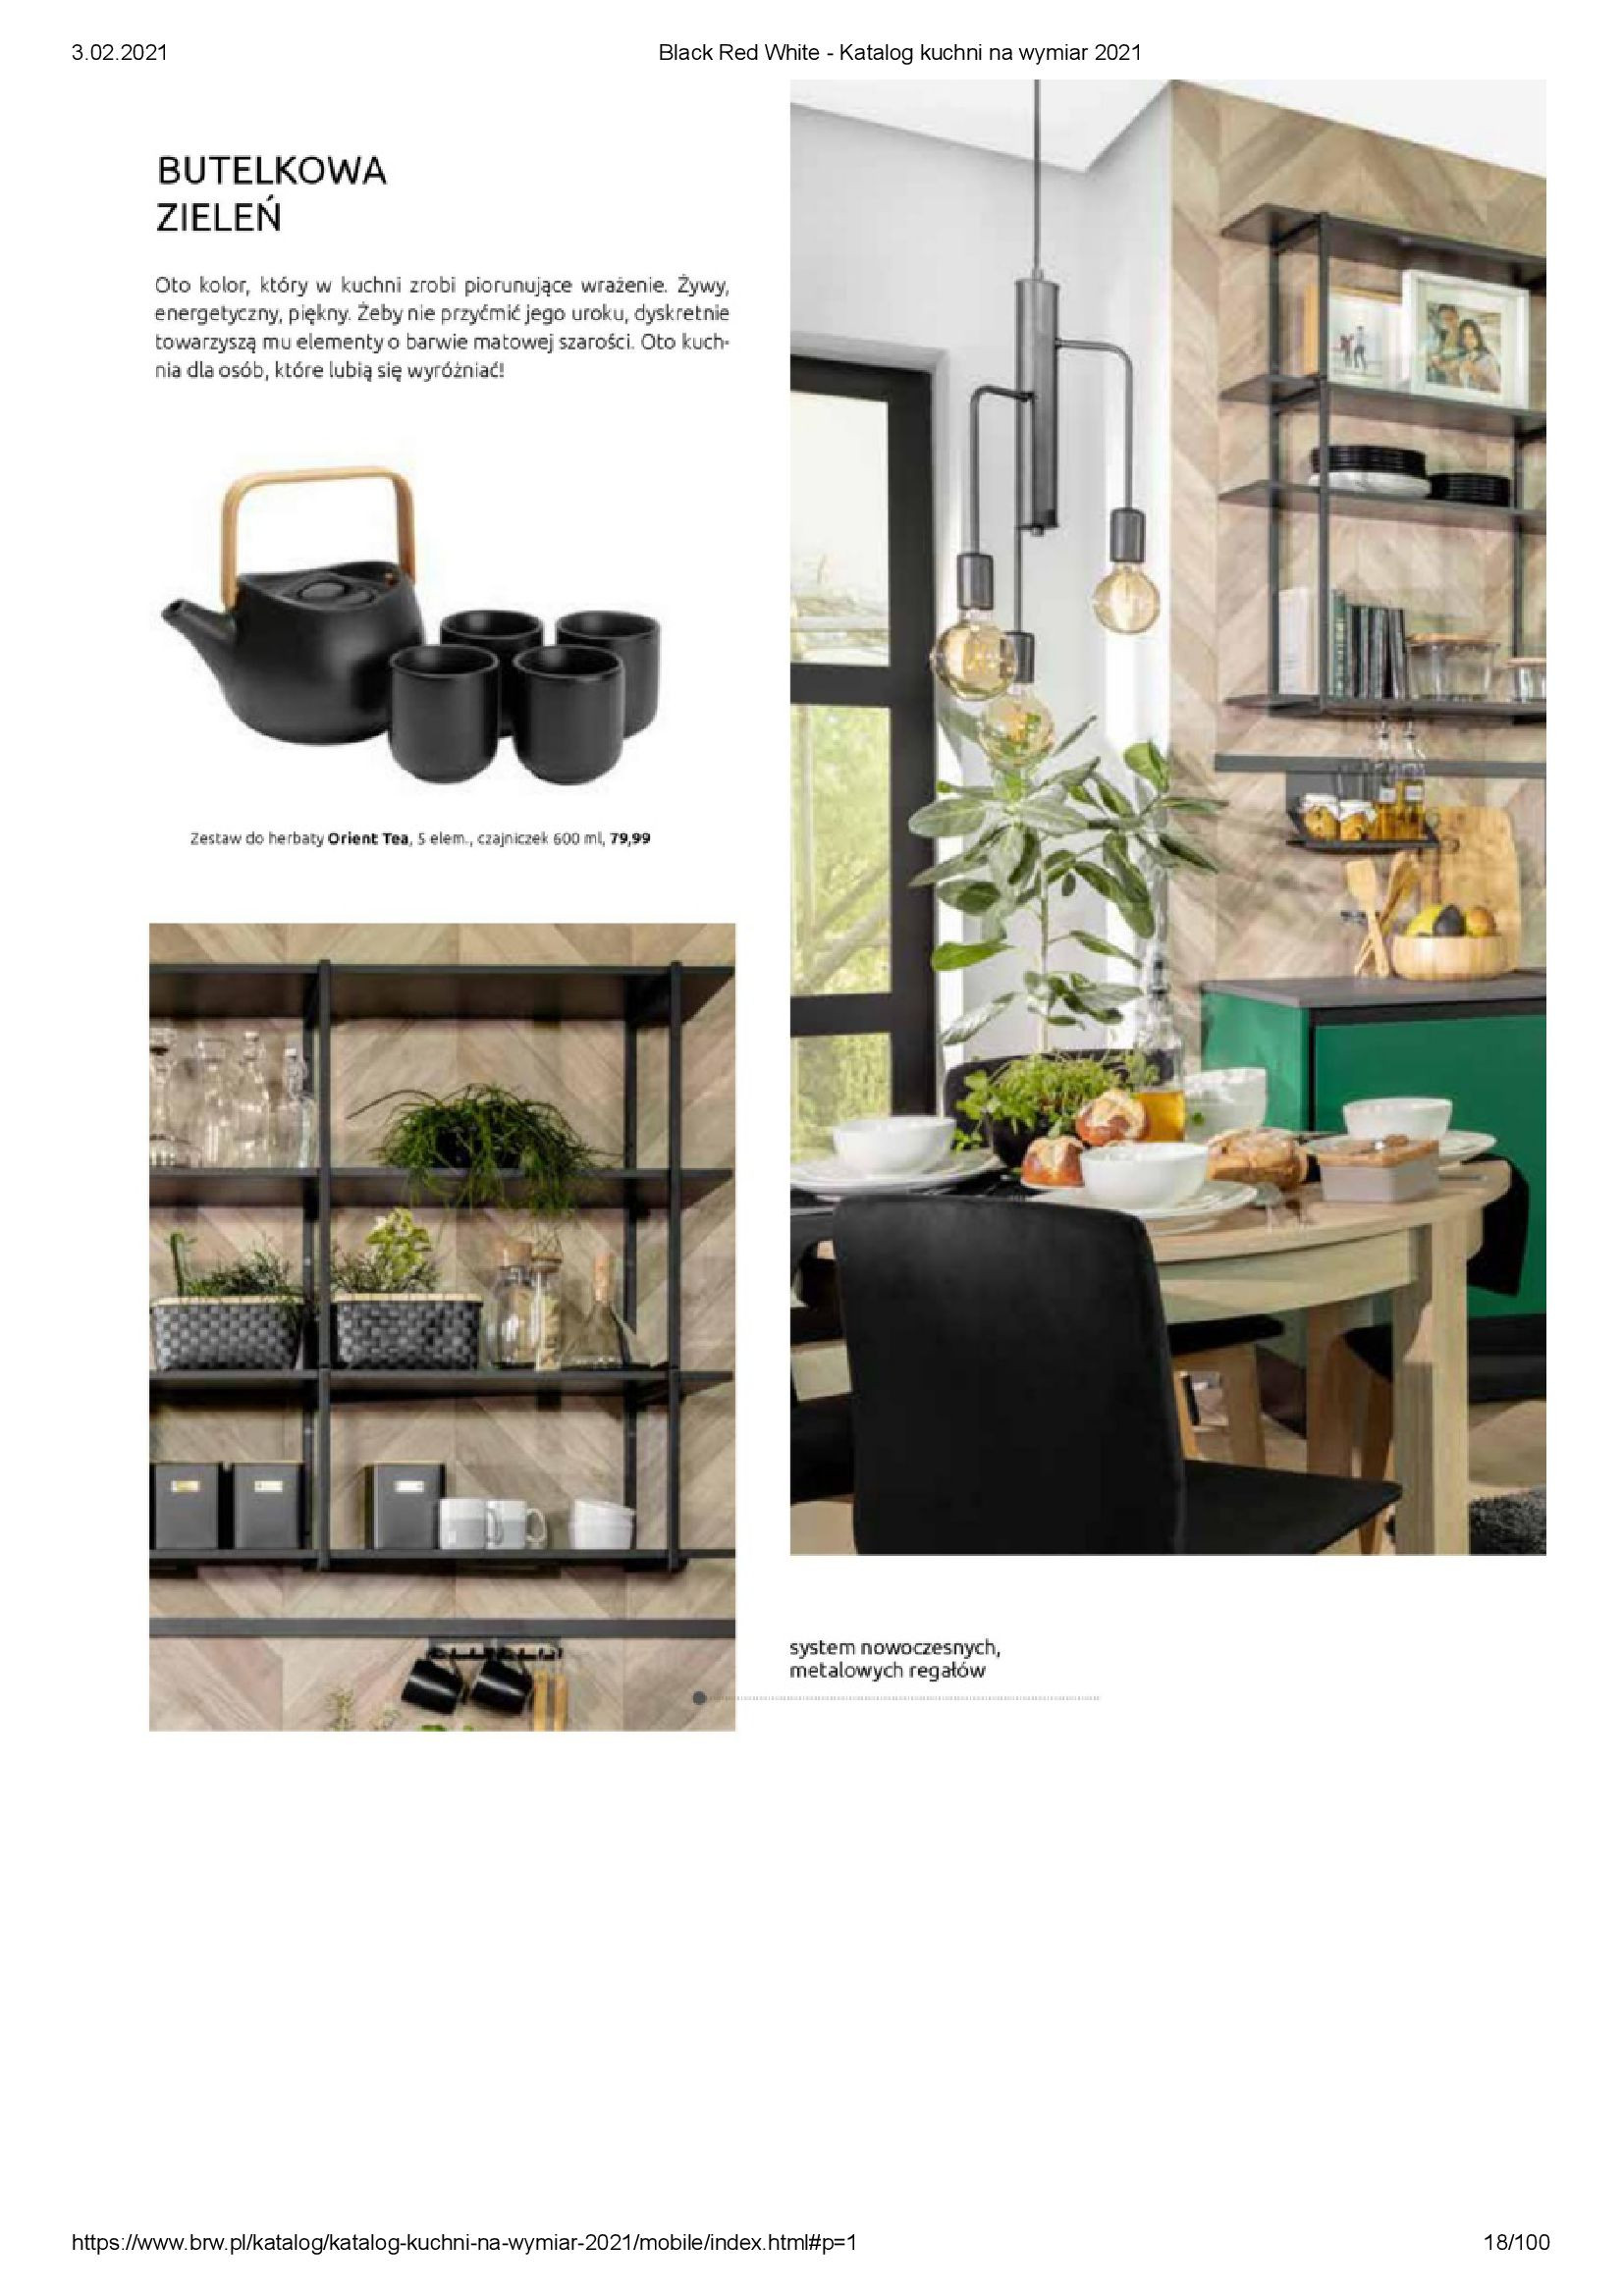 Gazetka Black Red White: Katalog - Kuchnie na wymiar Senso Kitchens 2021 2021-01-01 page-18